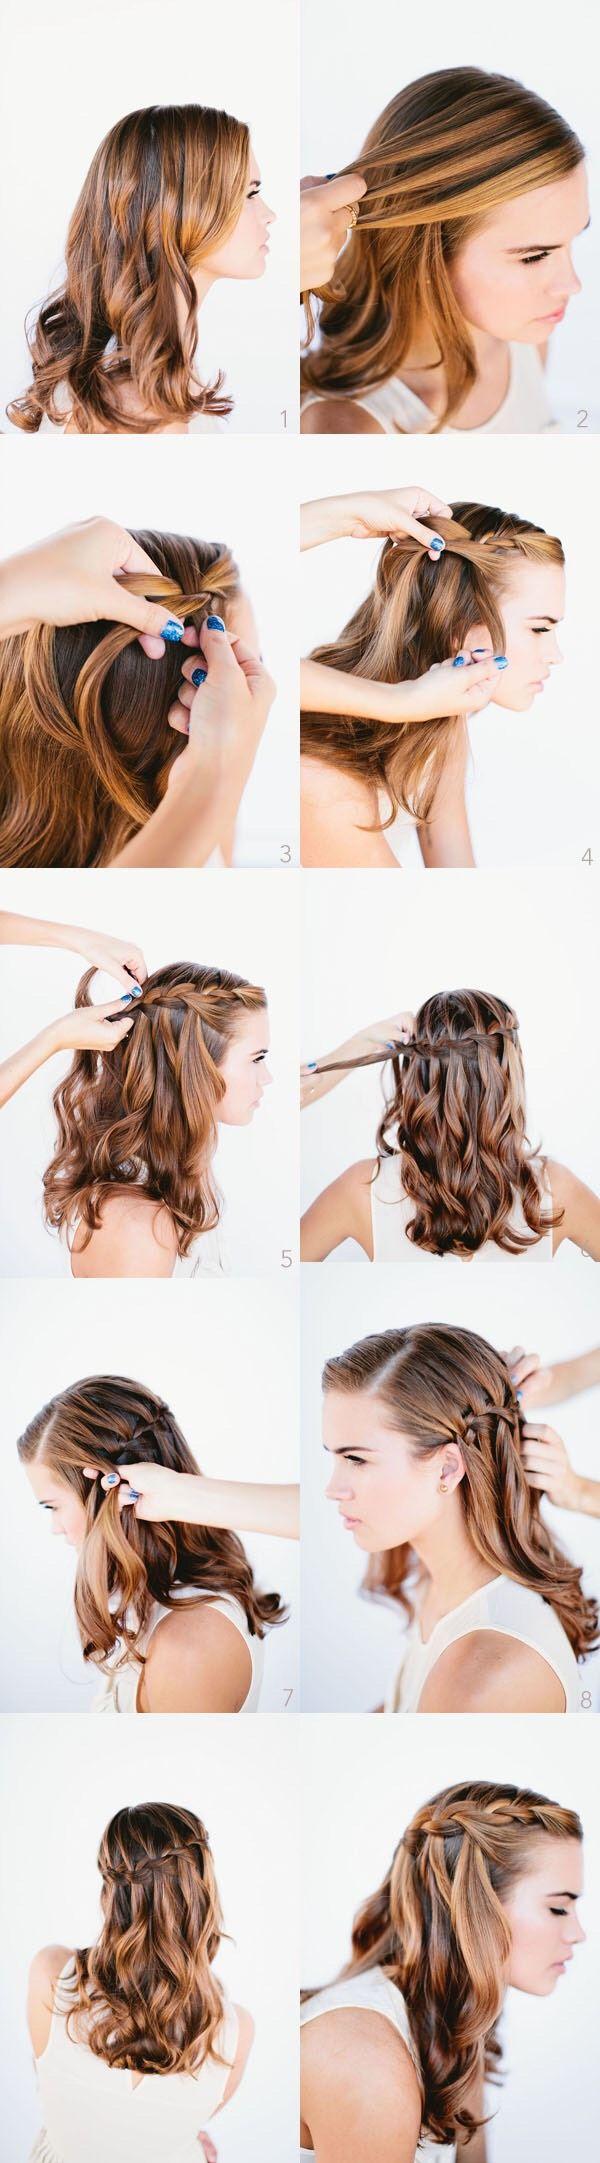 How To Waterfall Braid #Beauty #Trusper #Tip